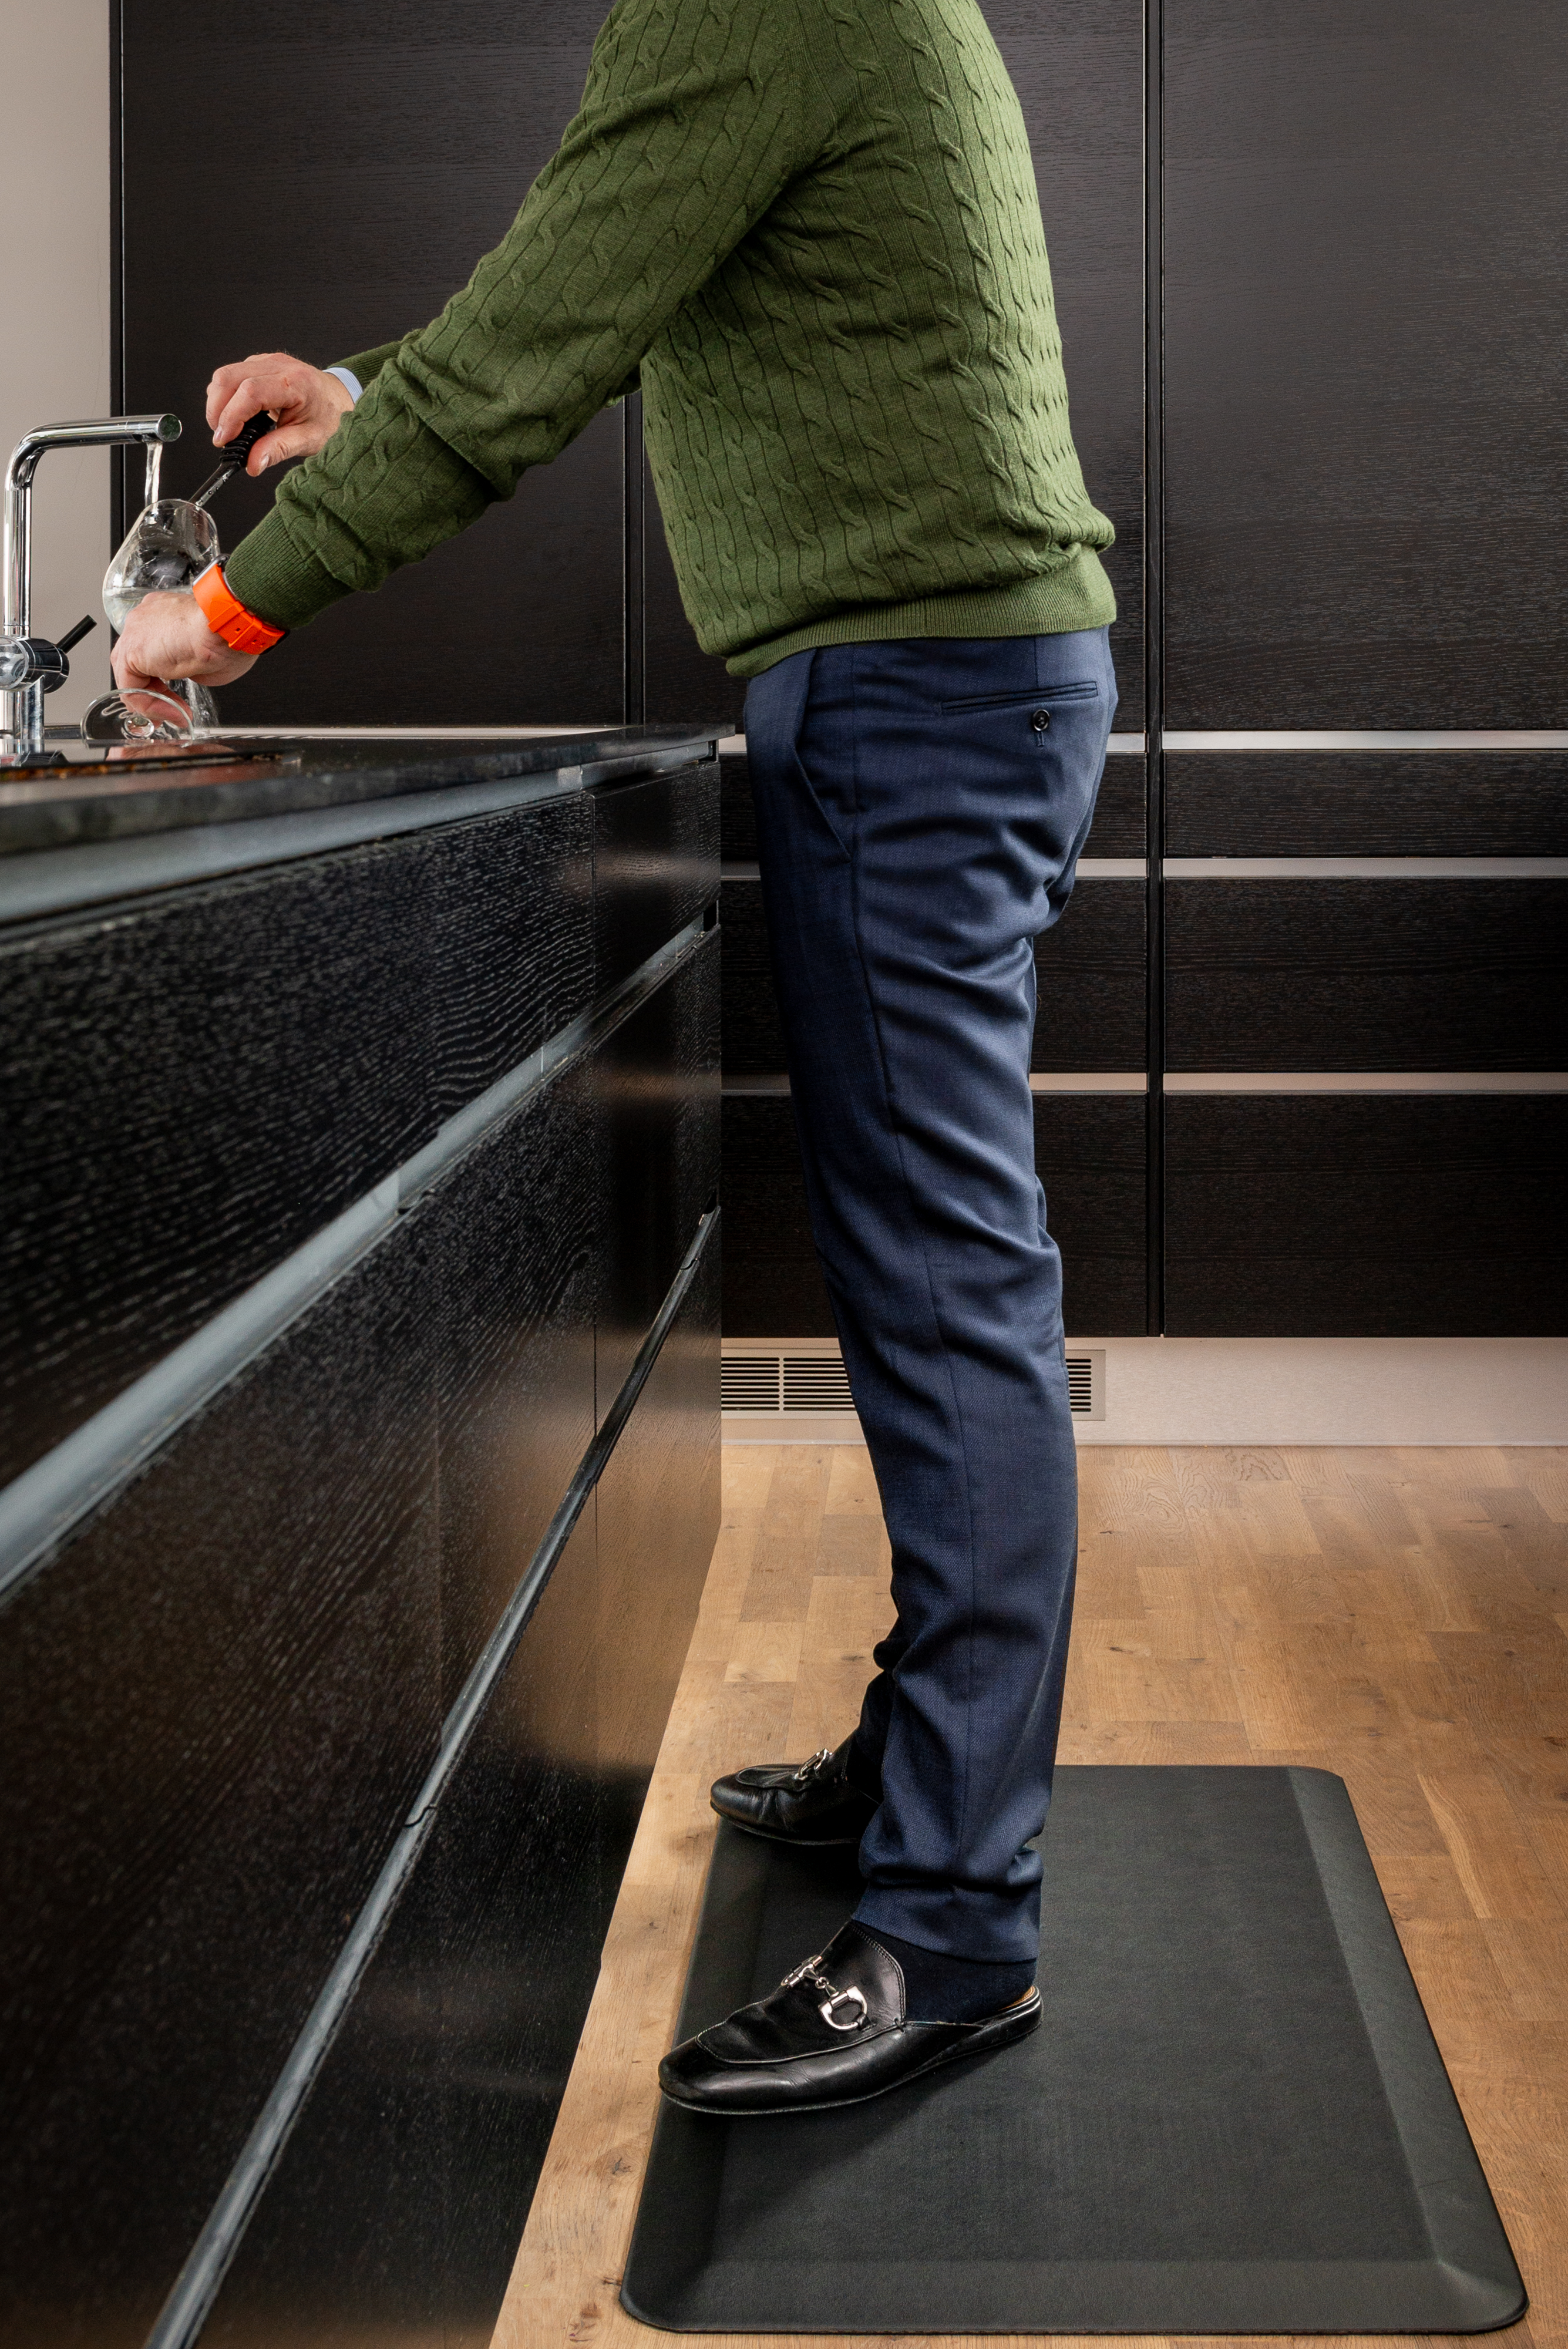 Home-Step Ergonomiskmatta i Polyuretan svart 51x99cm